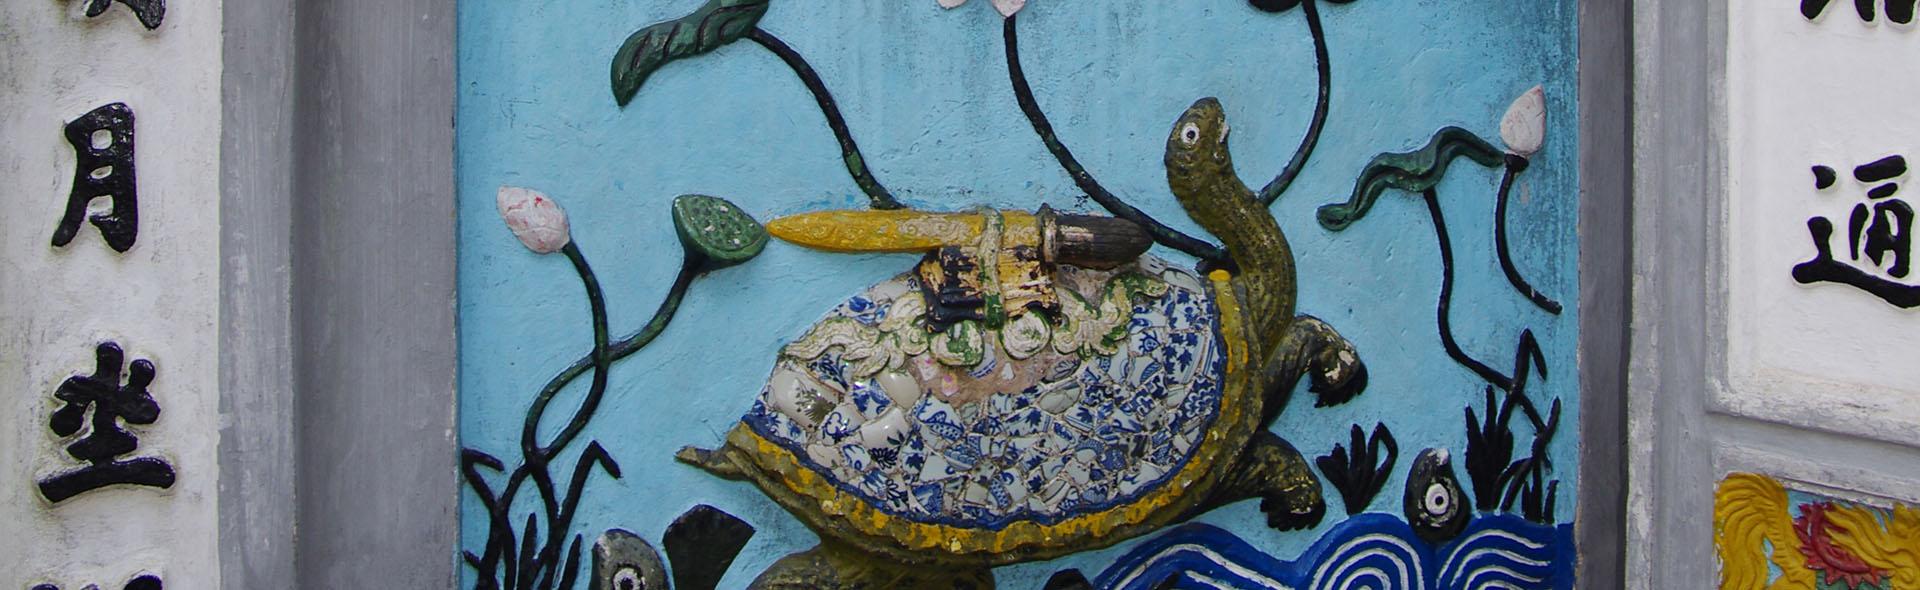 Die uralte Schildkröte Cu Rua